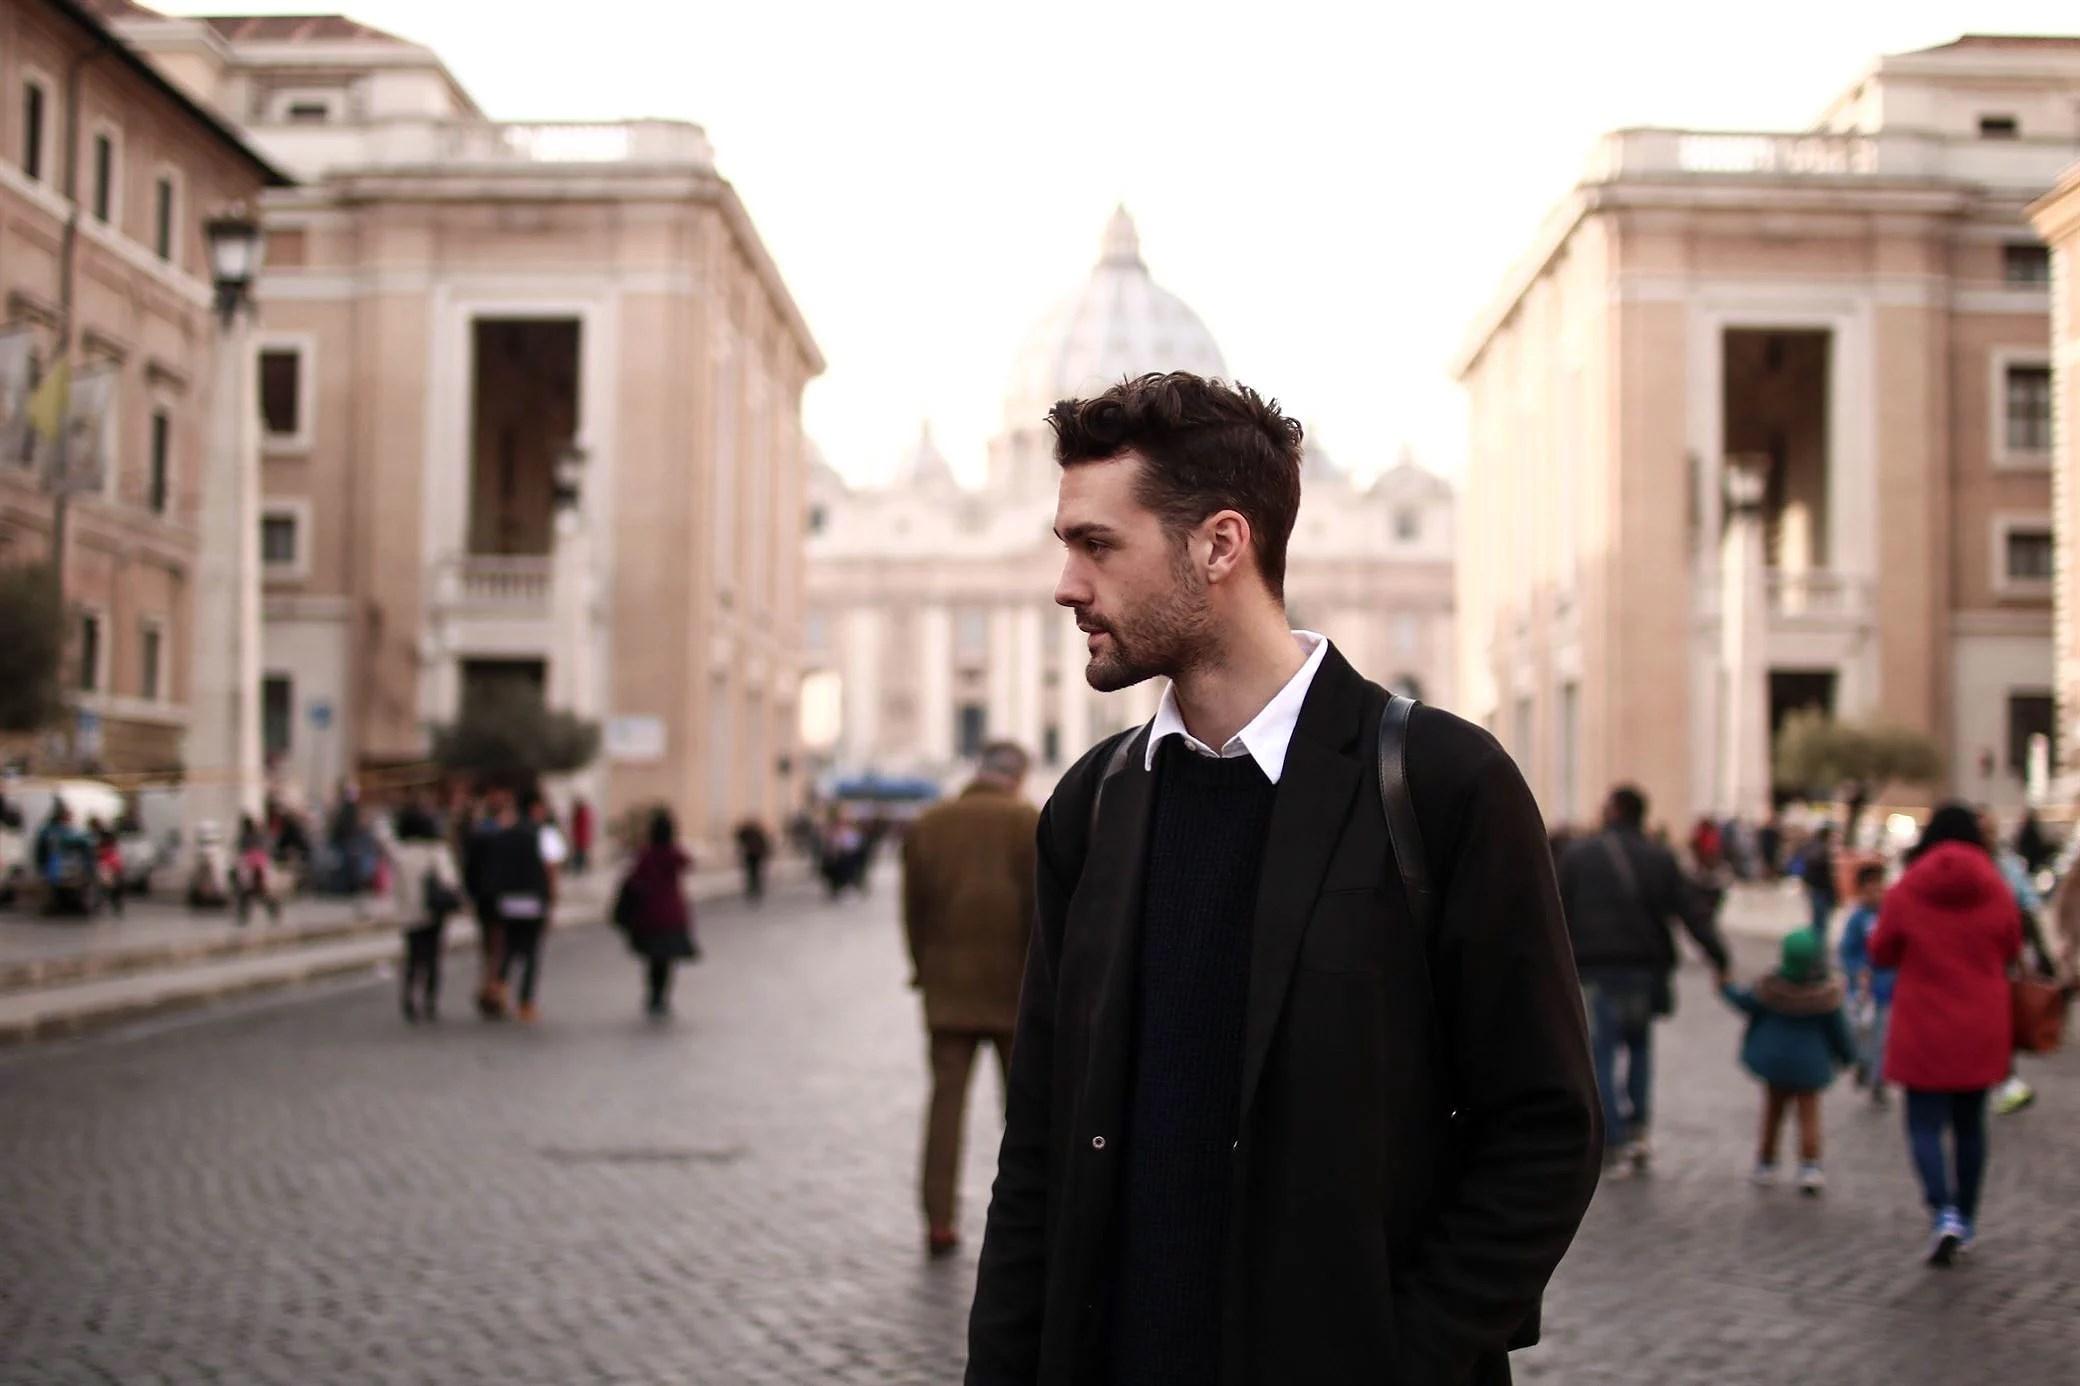 08/01/17 - Outfit från Rom